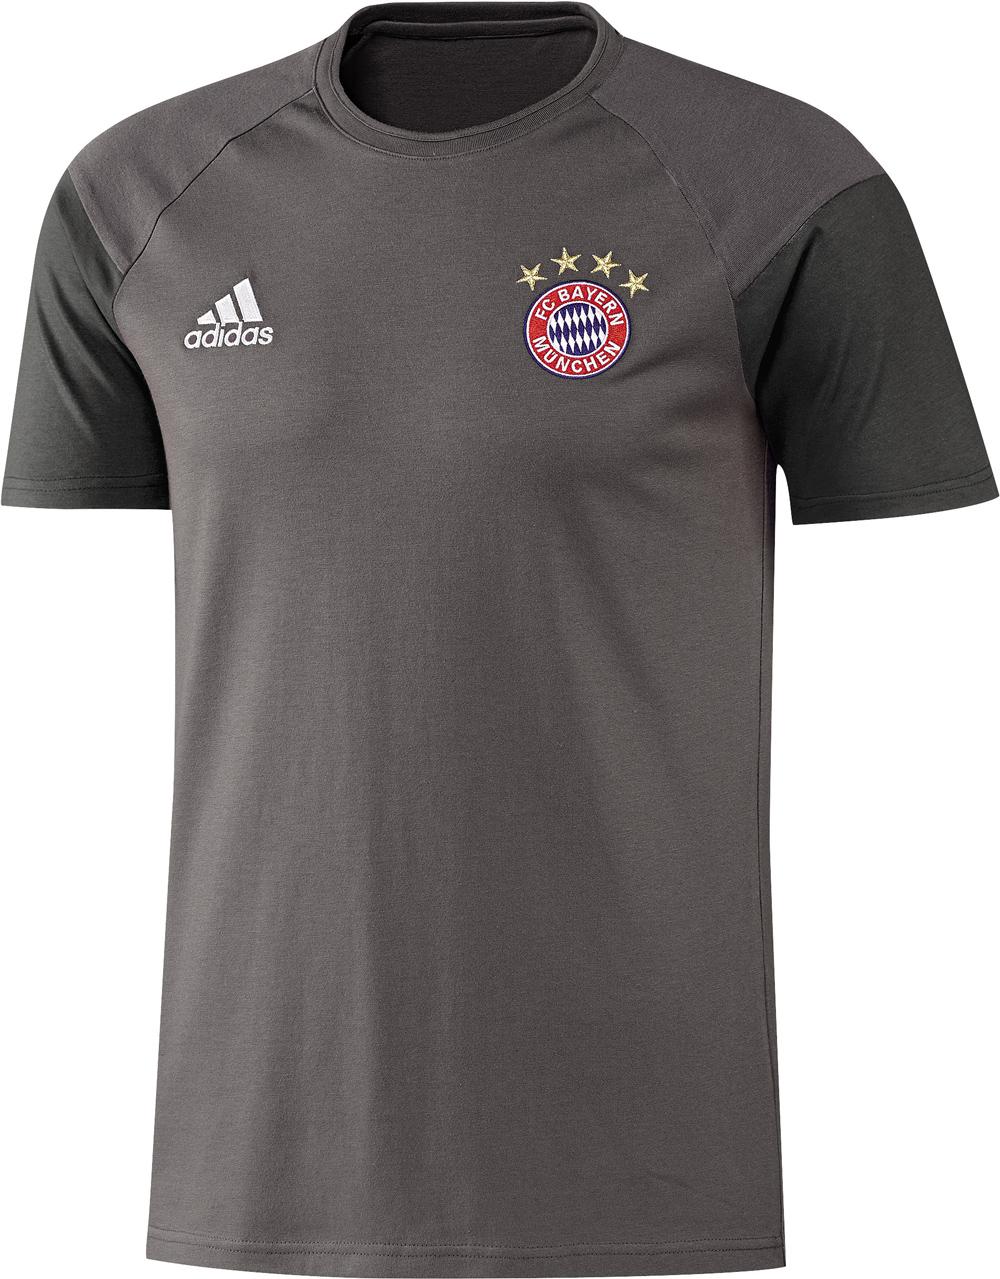 Herren T-Shirt FC Bayern, GRANIT/DGSOGR, L